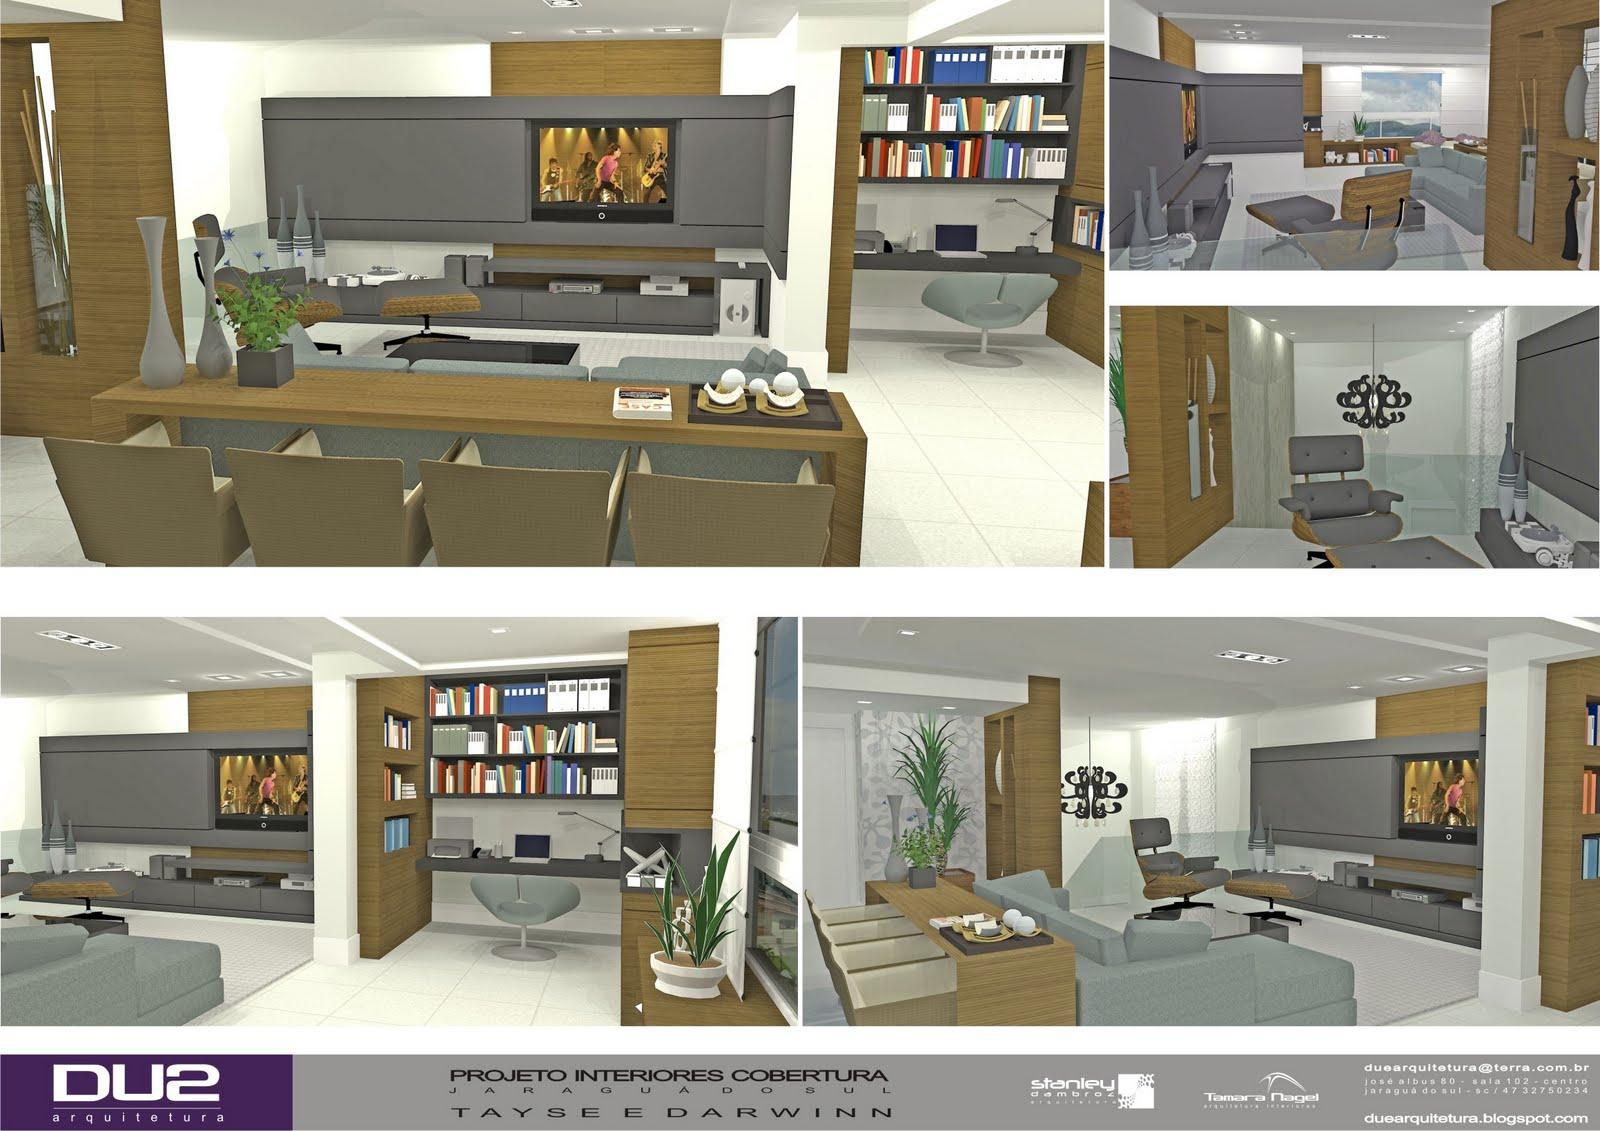 Amado DUE ARQUITETURA: Projeto Interiores Duplex - Parte II ME33